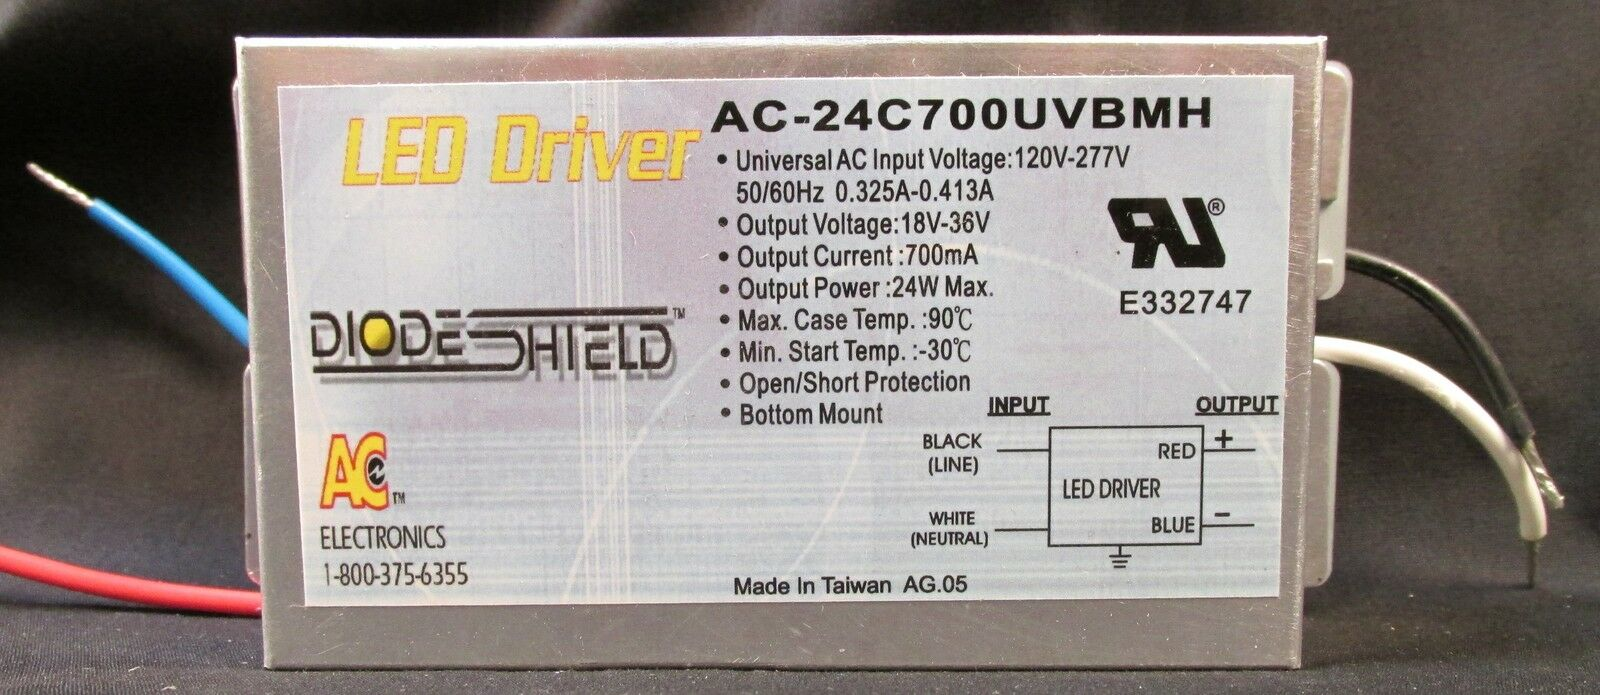 AC ELECTRONICS  AC-24C700UVBMH LED DRIVER 24 WATTS